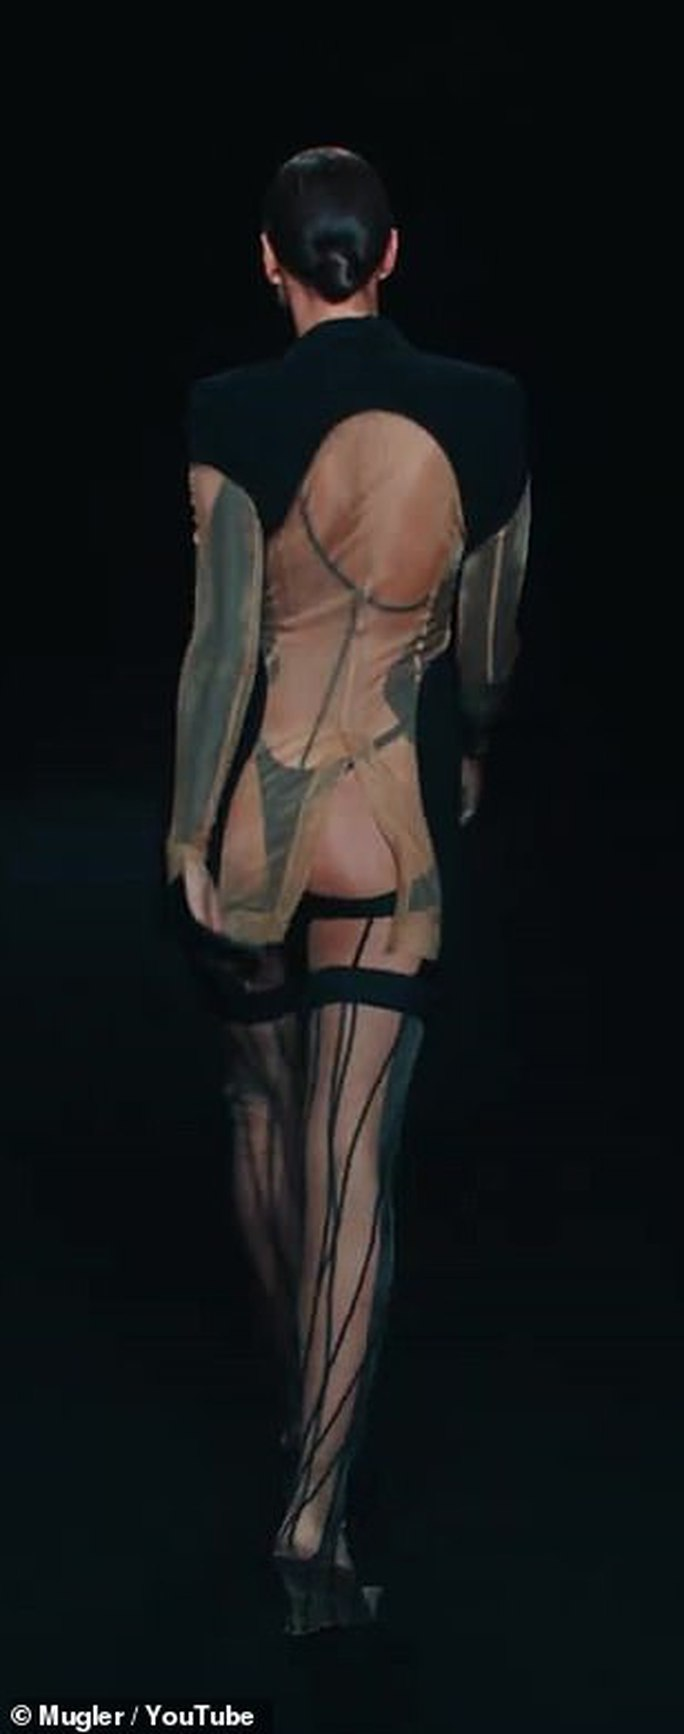 Siêu mẫu Bella Hadid, Irina Shayk khoe vẻ gợi cảm  - Ảnh 7.